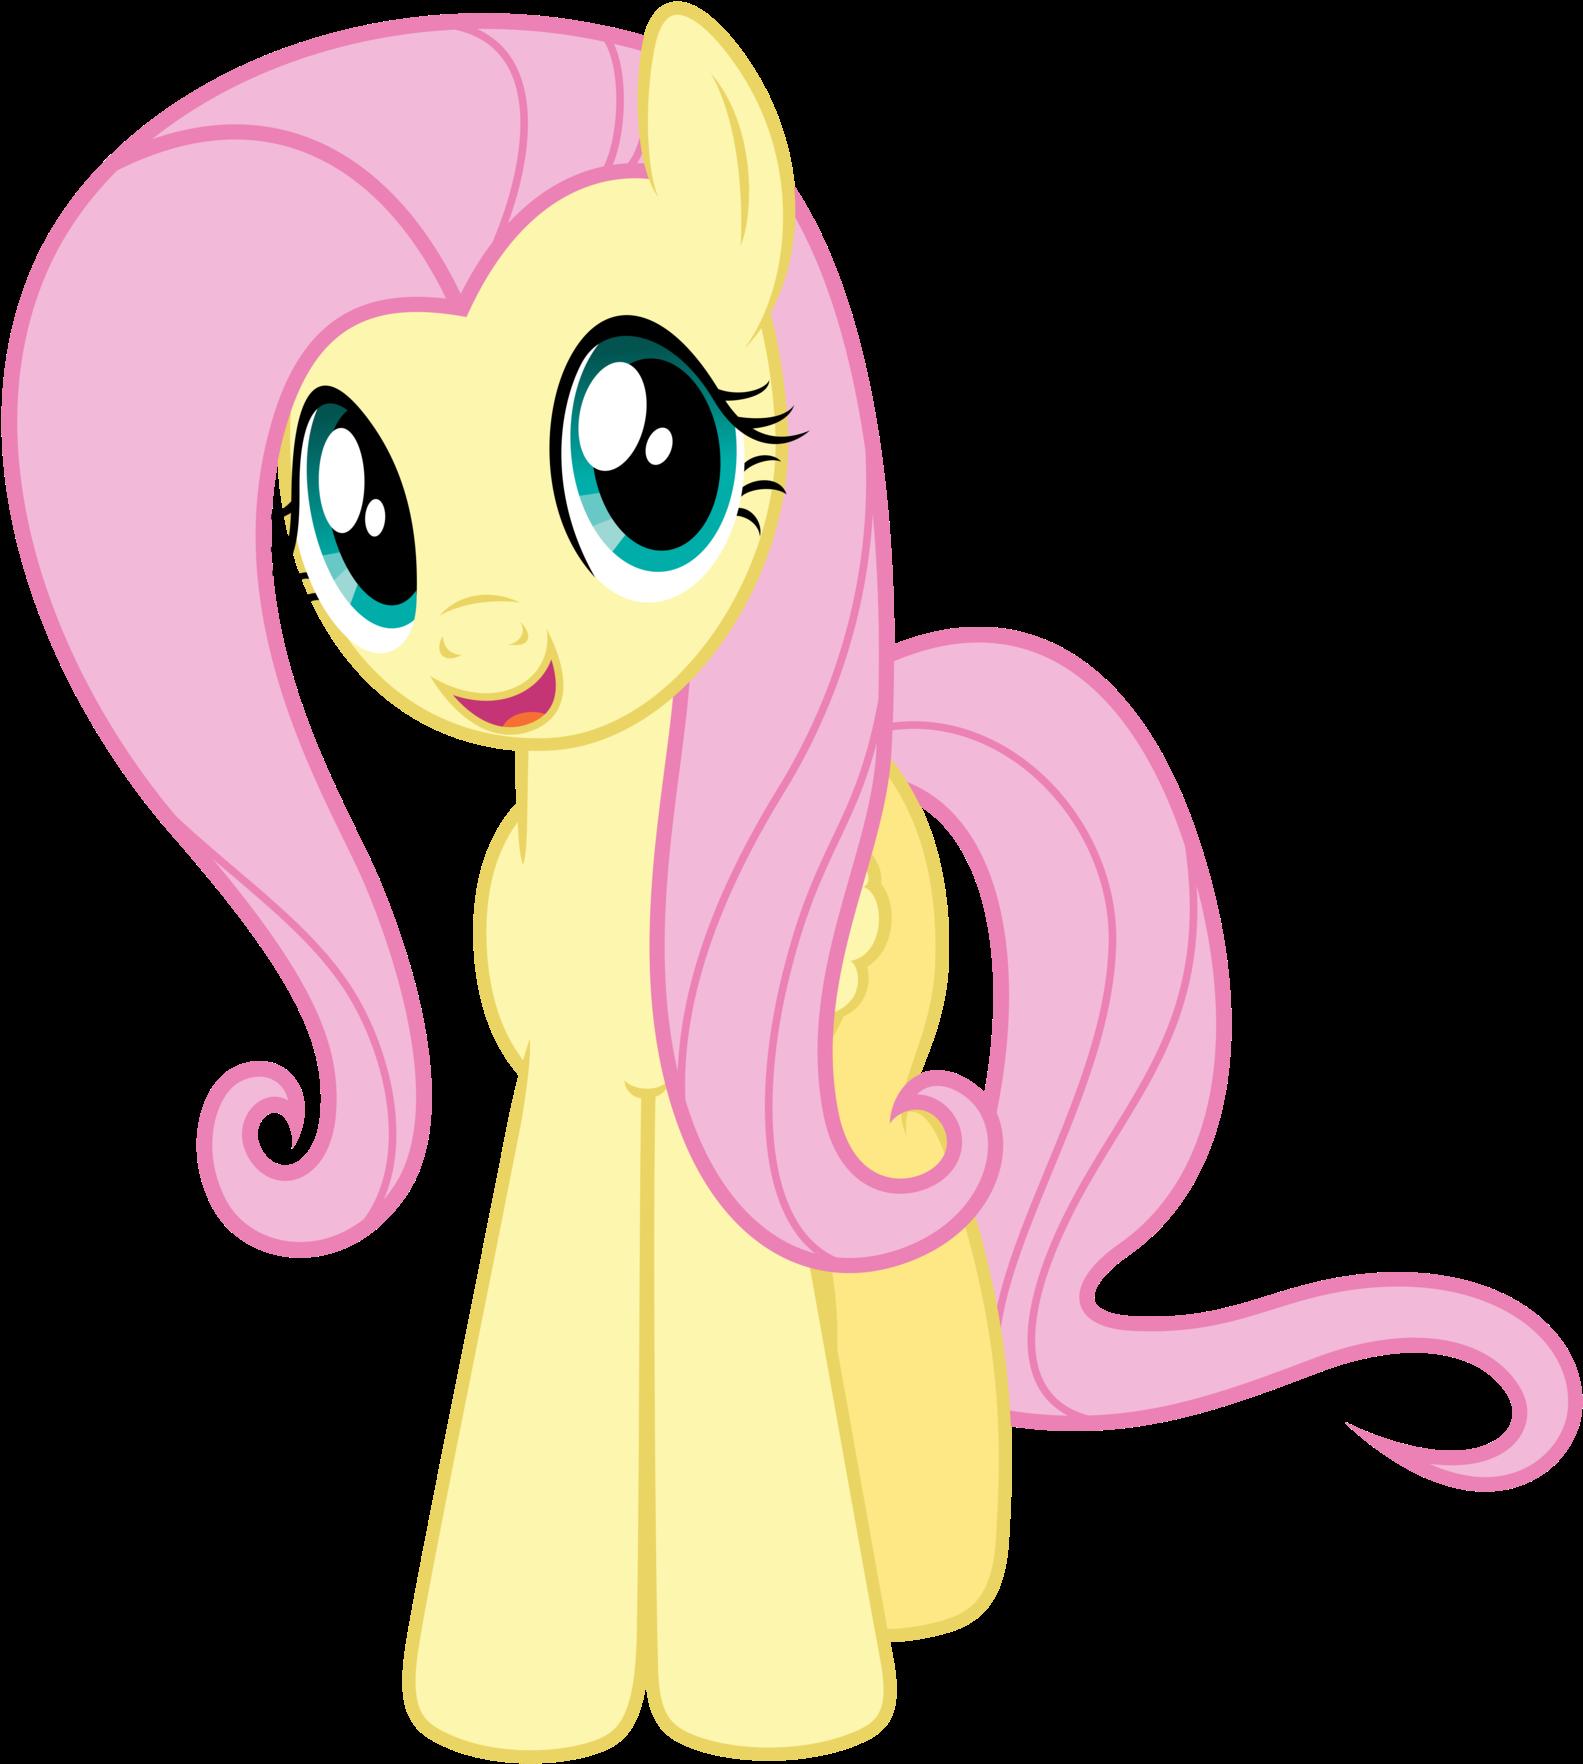 My Little Pony Friendship Is Magic Wallpaper Probably Gambar Kuda Poni Lucu 1583x1764 Download Hd Wallpaper Wallpapertip